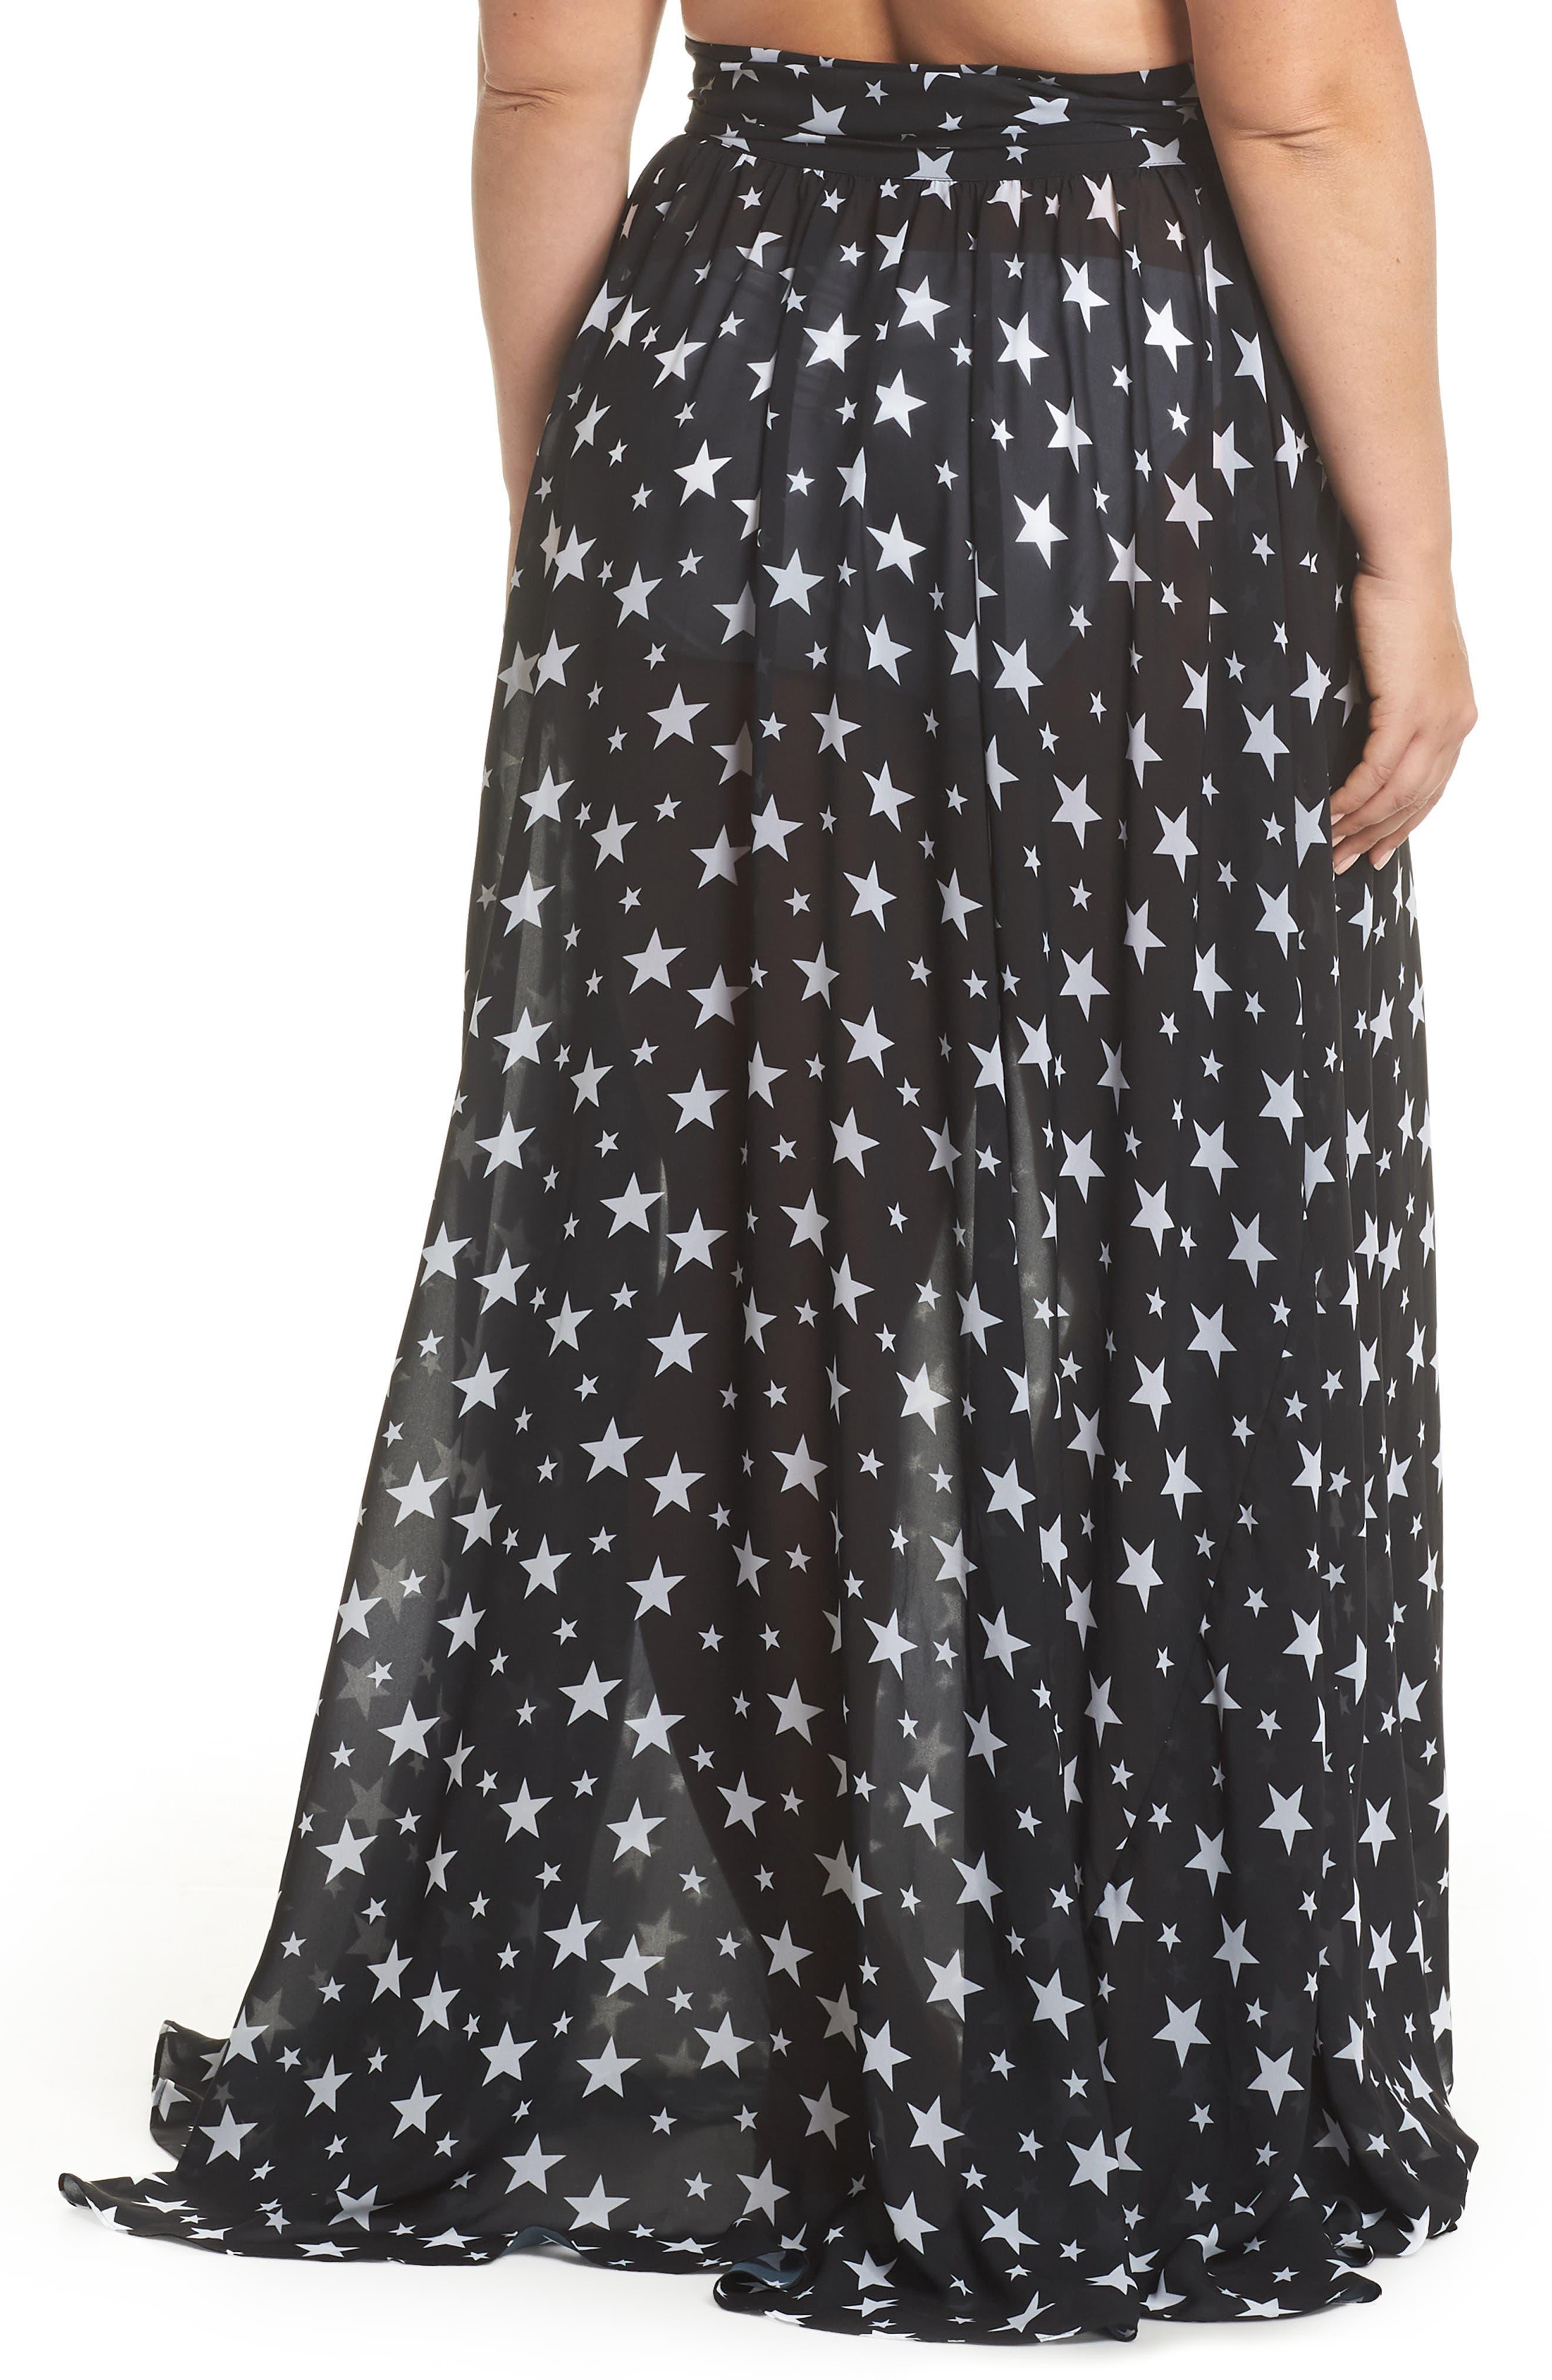 Cannes Cover-Up Skirt,                             Alternate thumbnail 2, color,                             Black Star